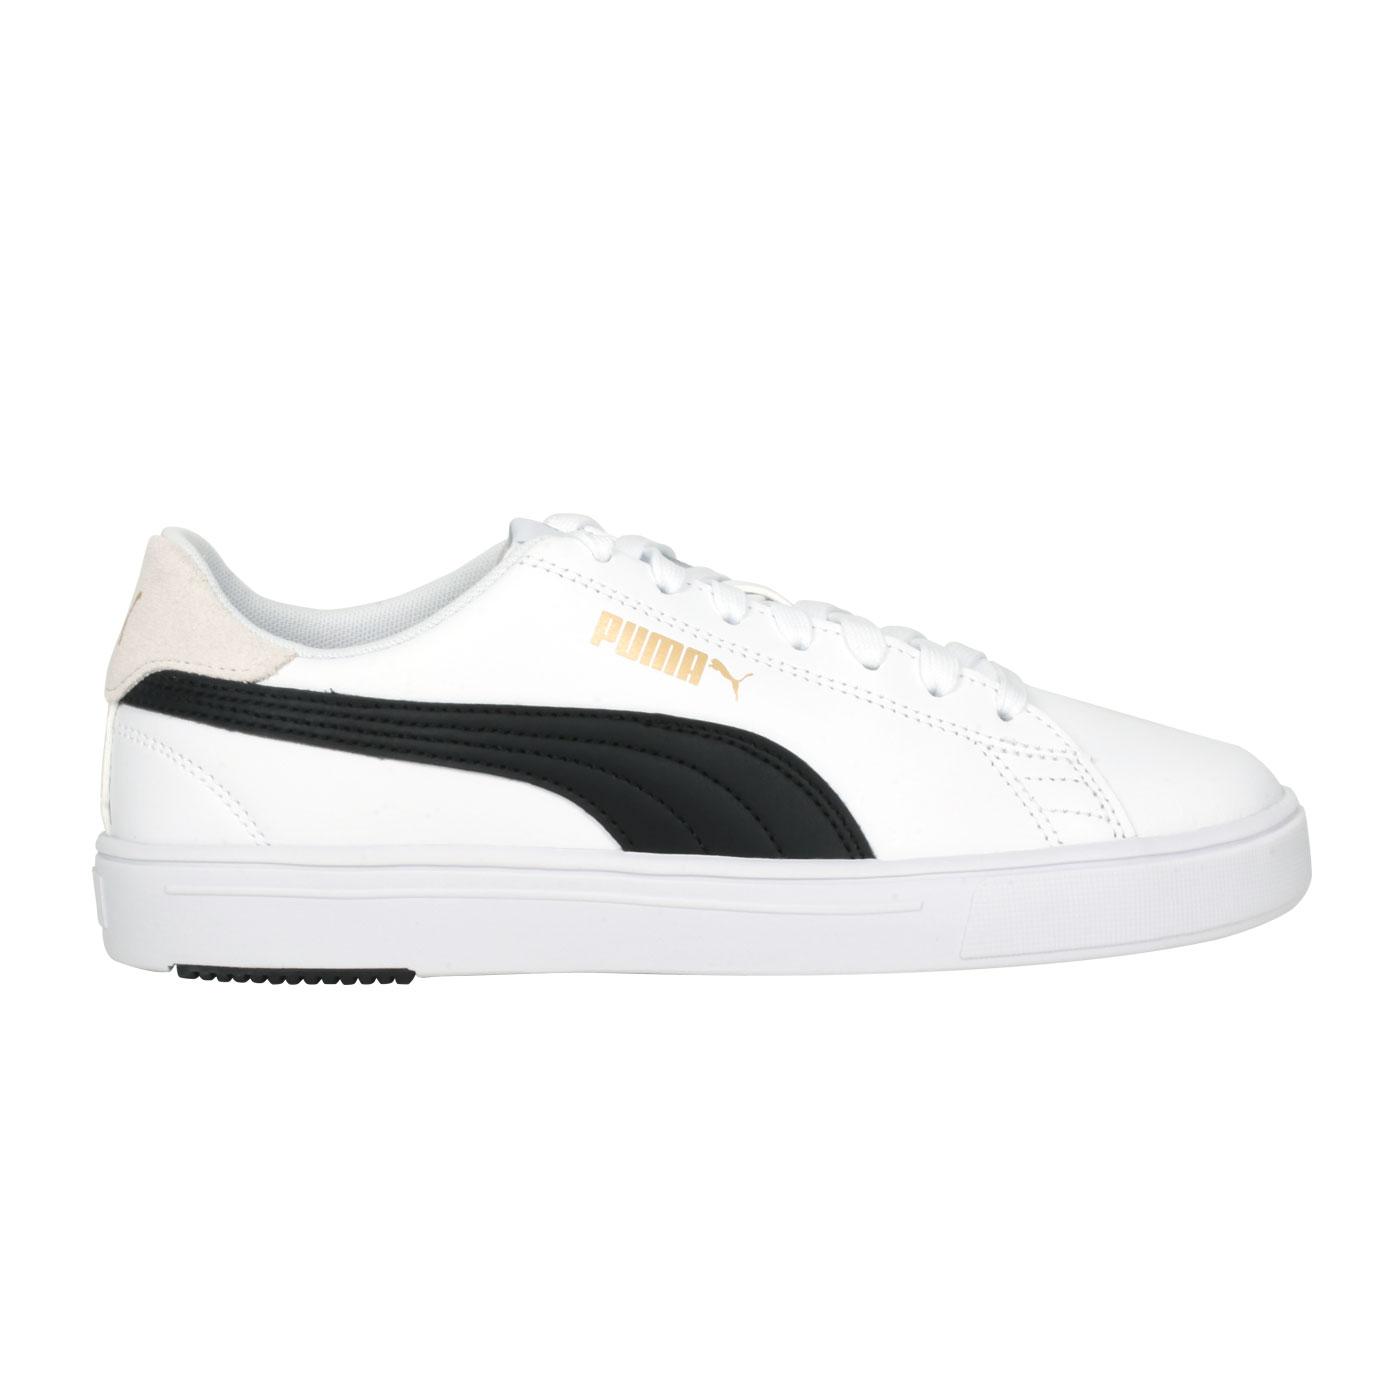 PUMA 男女休閒鞋  @Puma Serve Pro Lite@37490208 - 白黑金